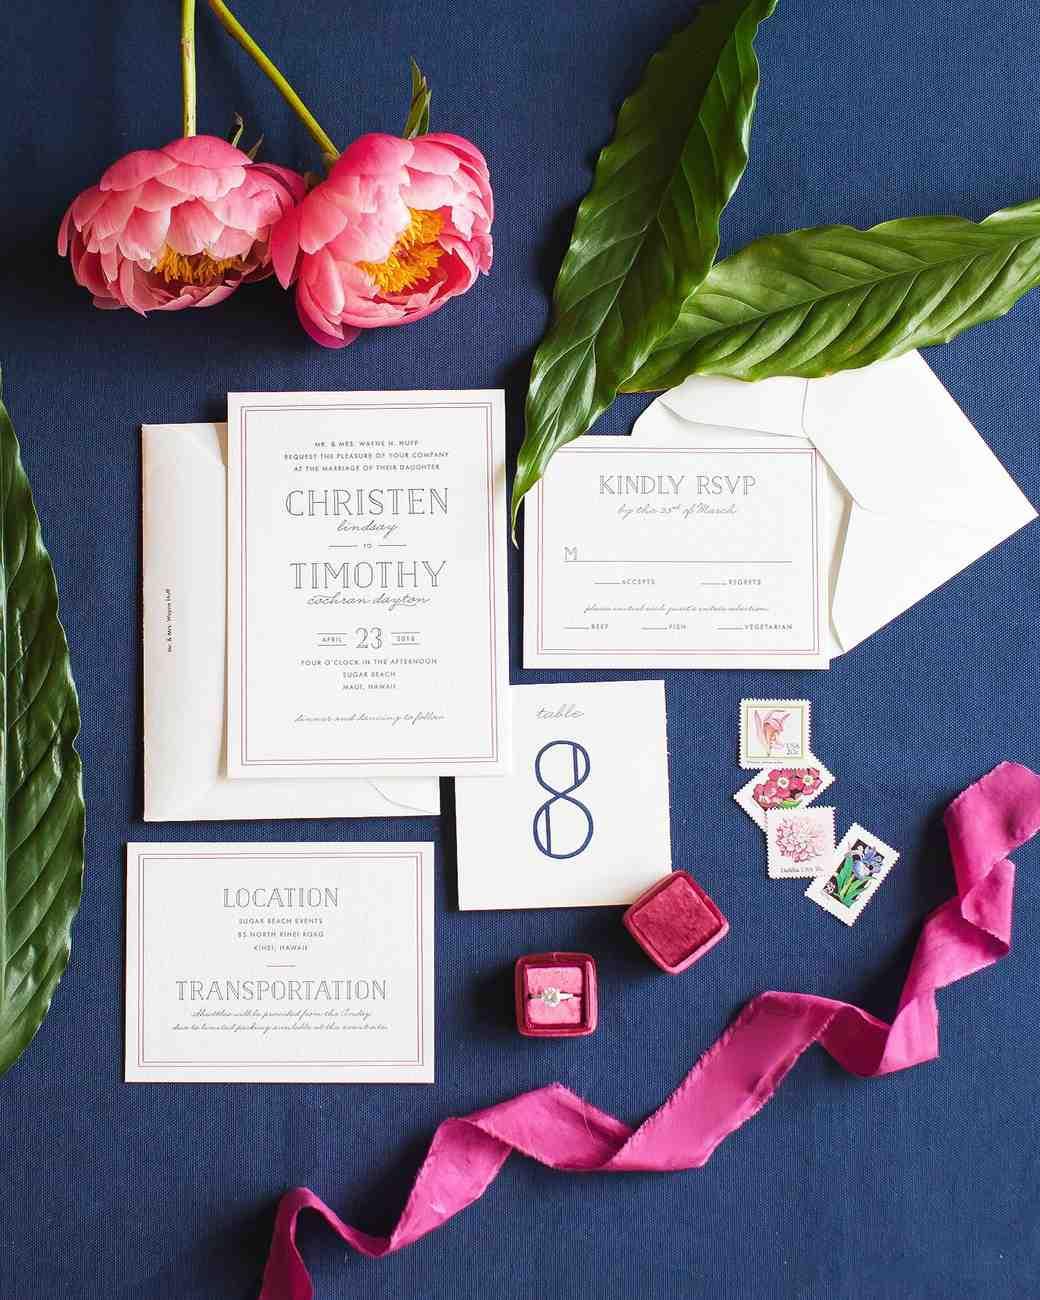 christen-tim-wedding-stationery-20885-6143924-0816.jpg